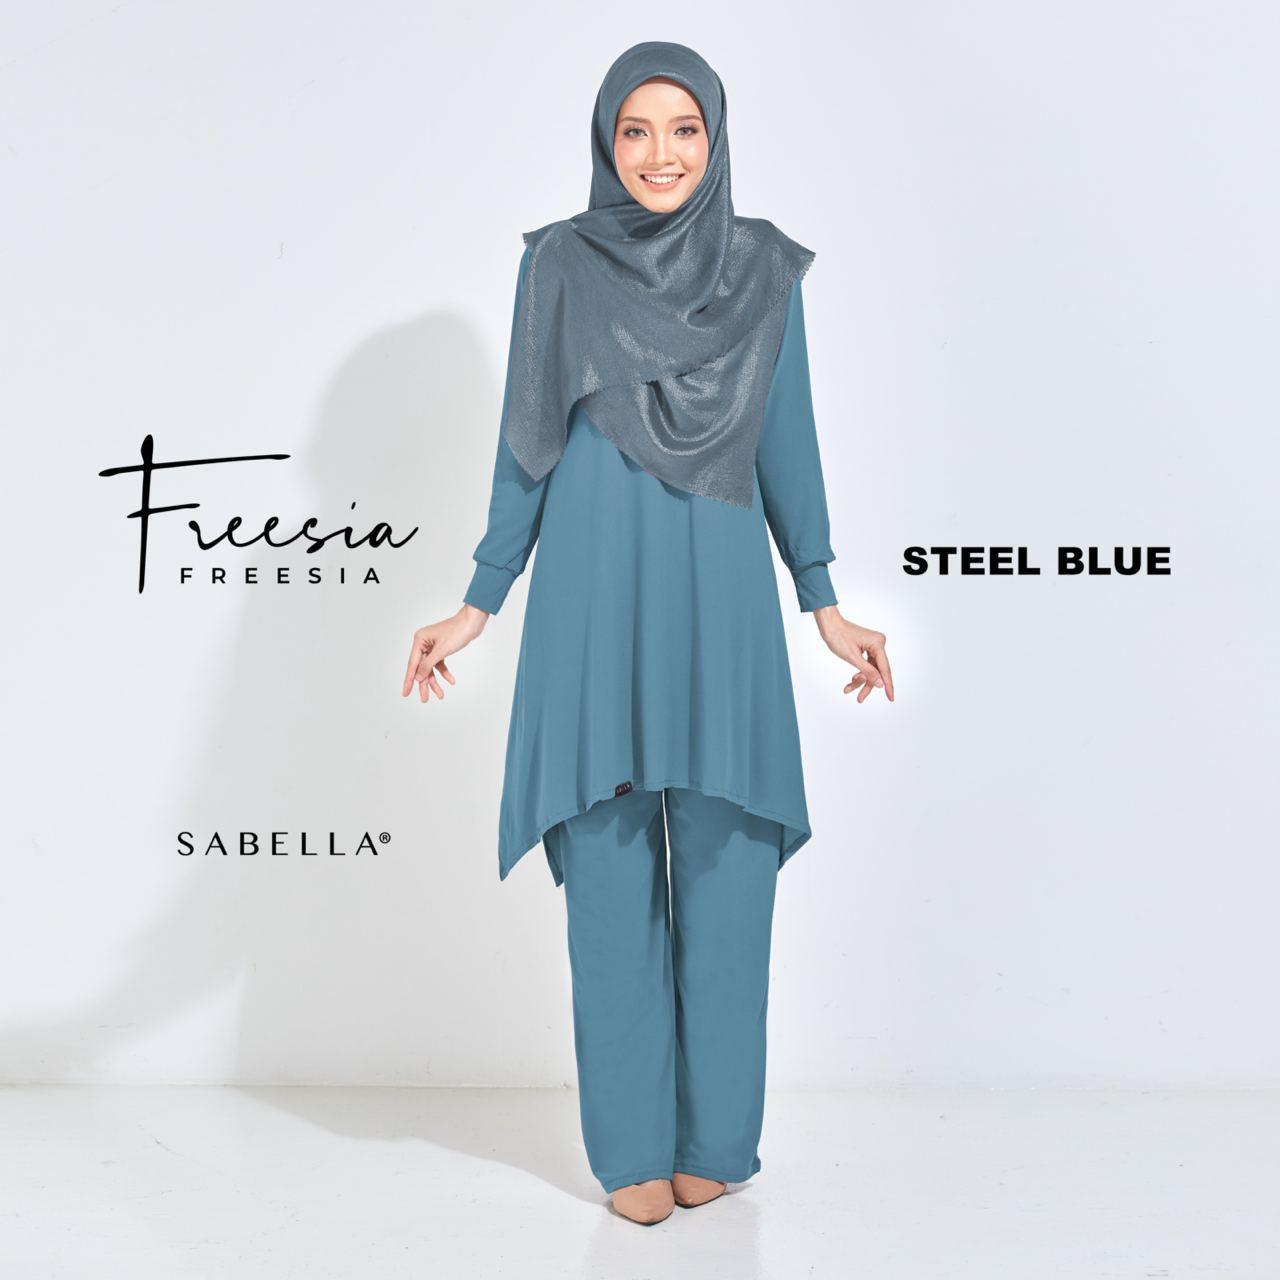 Freesia Steel Blue (R)